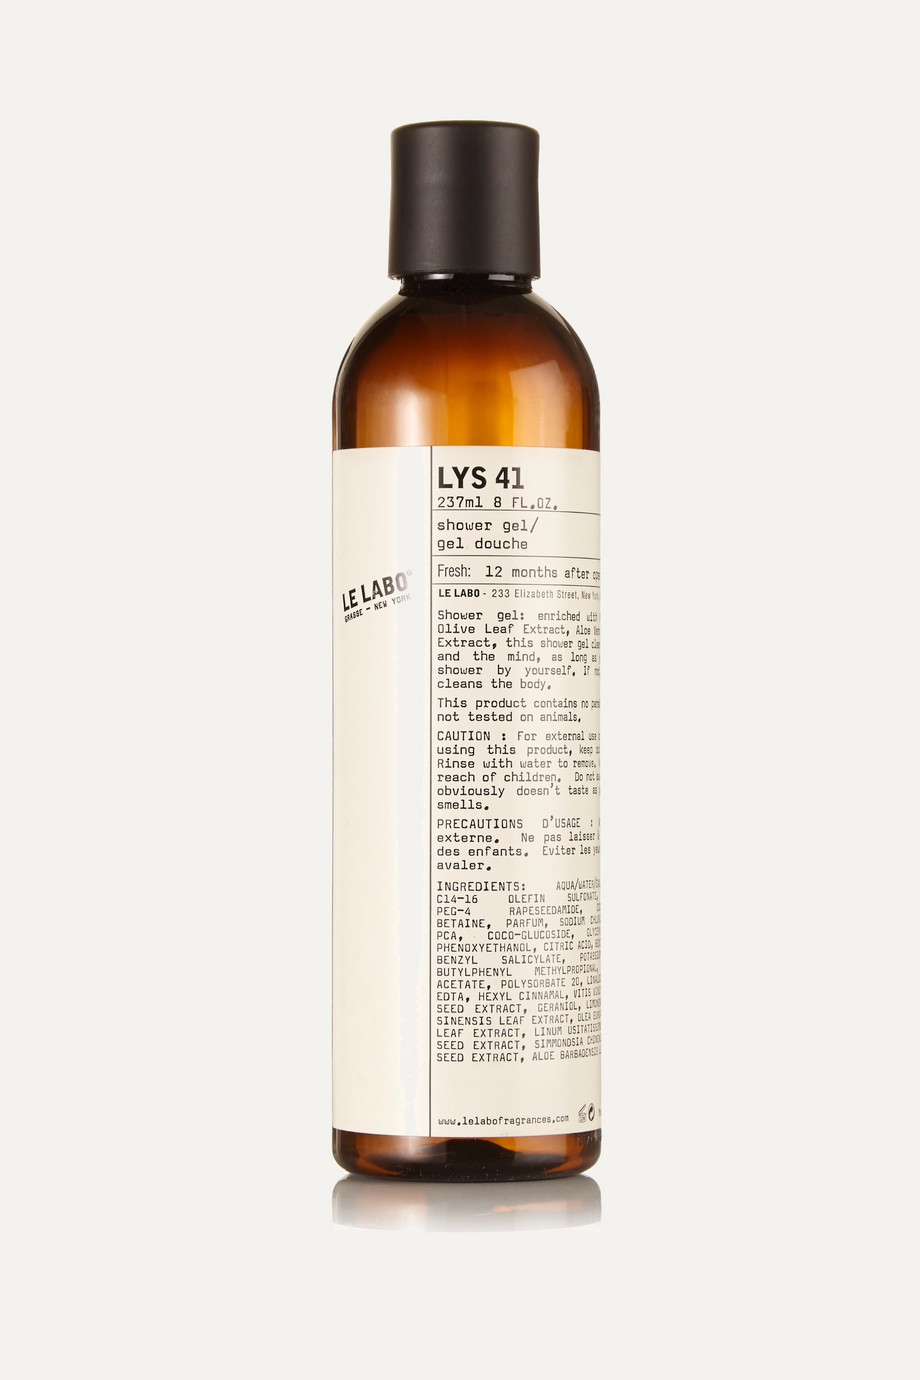 Le Labo Lys 41 Shower Gel, 237ml – Duschgel